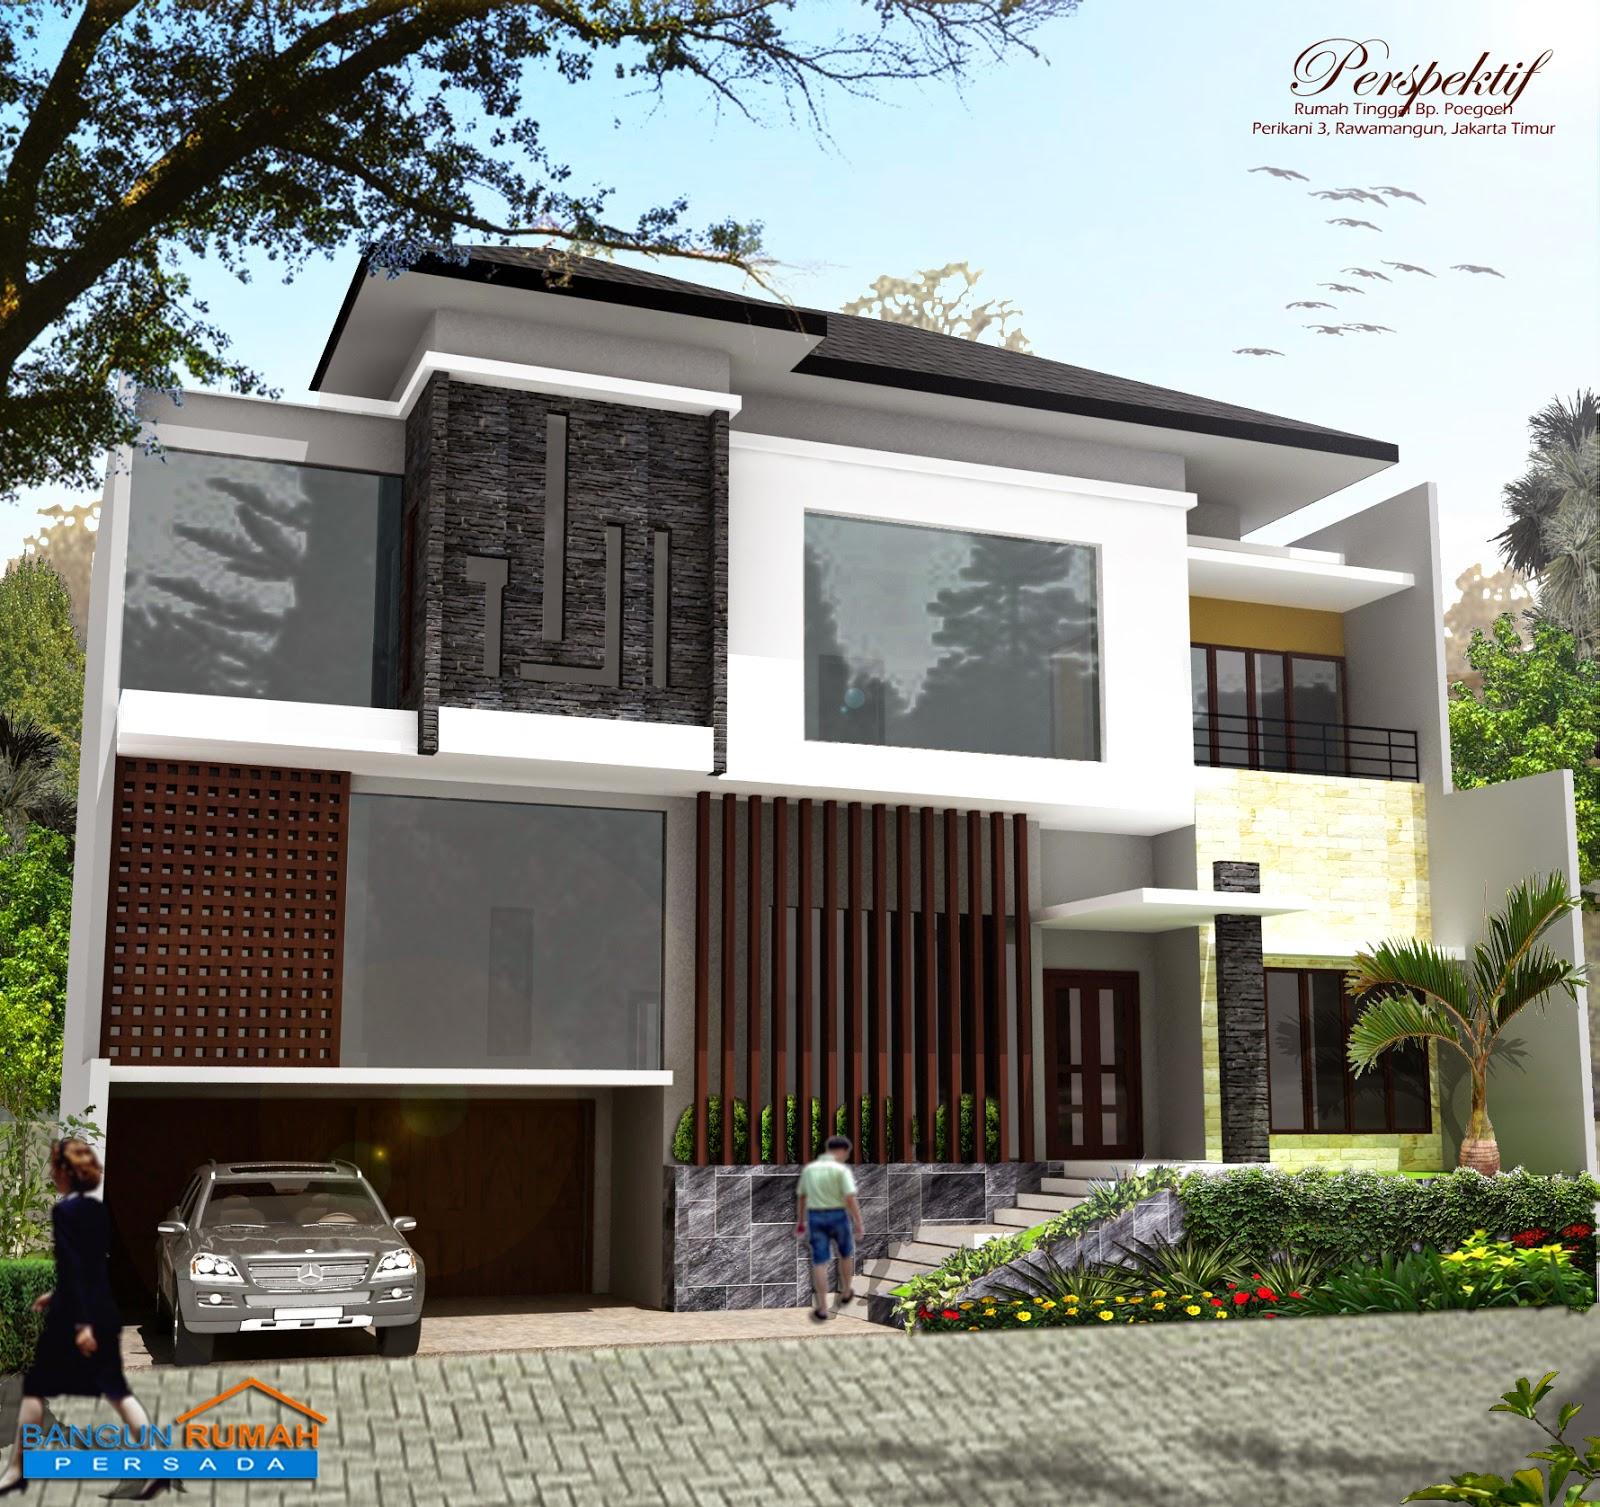 Desain Rumah Minimalis 2 Lantai Luas Tanah 200M2 Gambar Jasa Seo